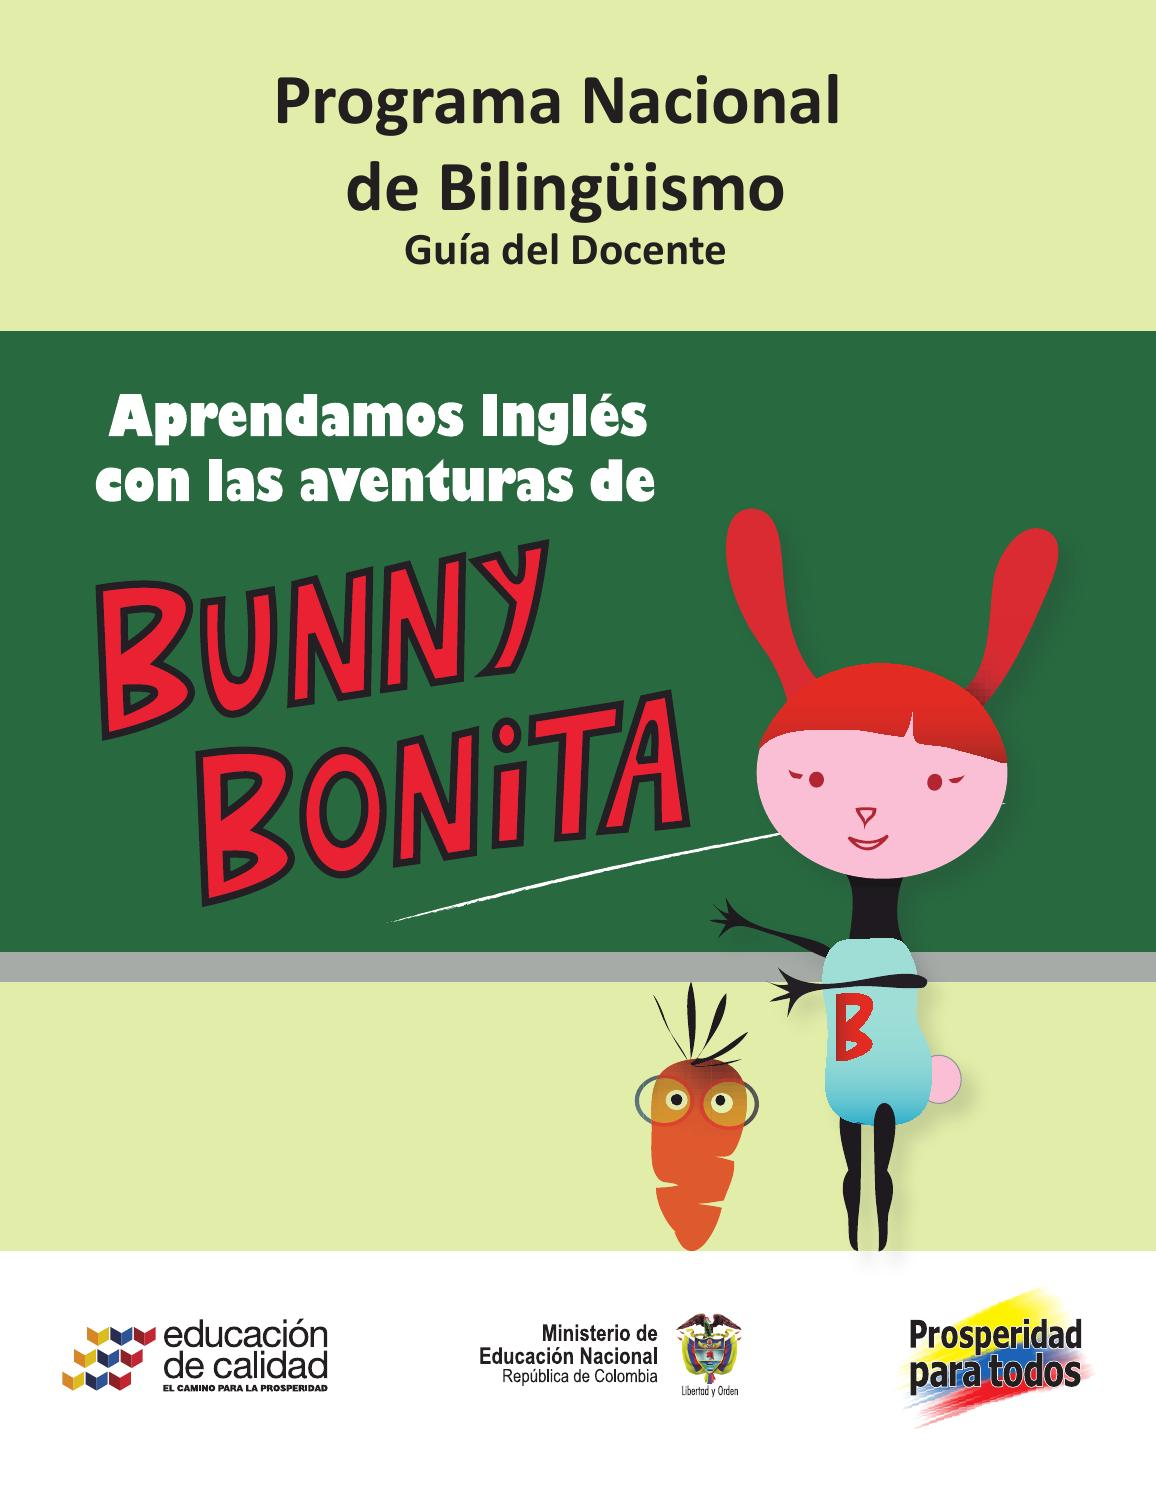 Bunny bonita by Claudia Rocio Hdez Carvajal - issuu